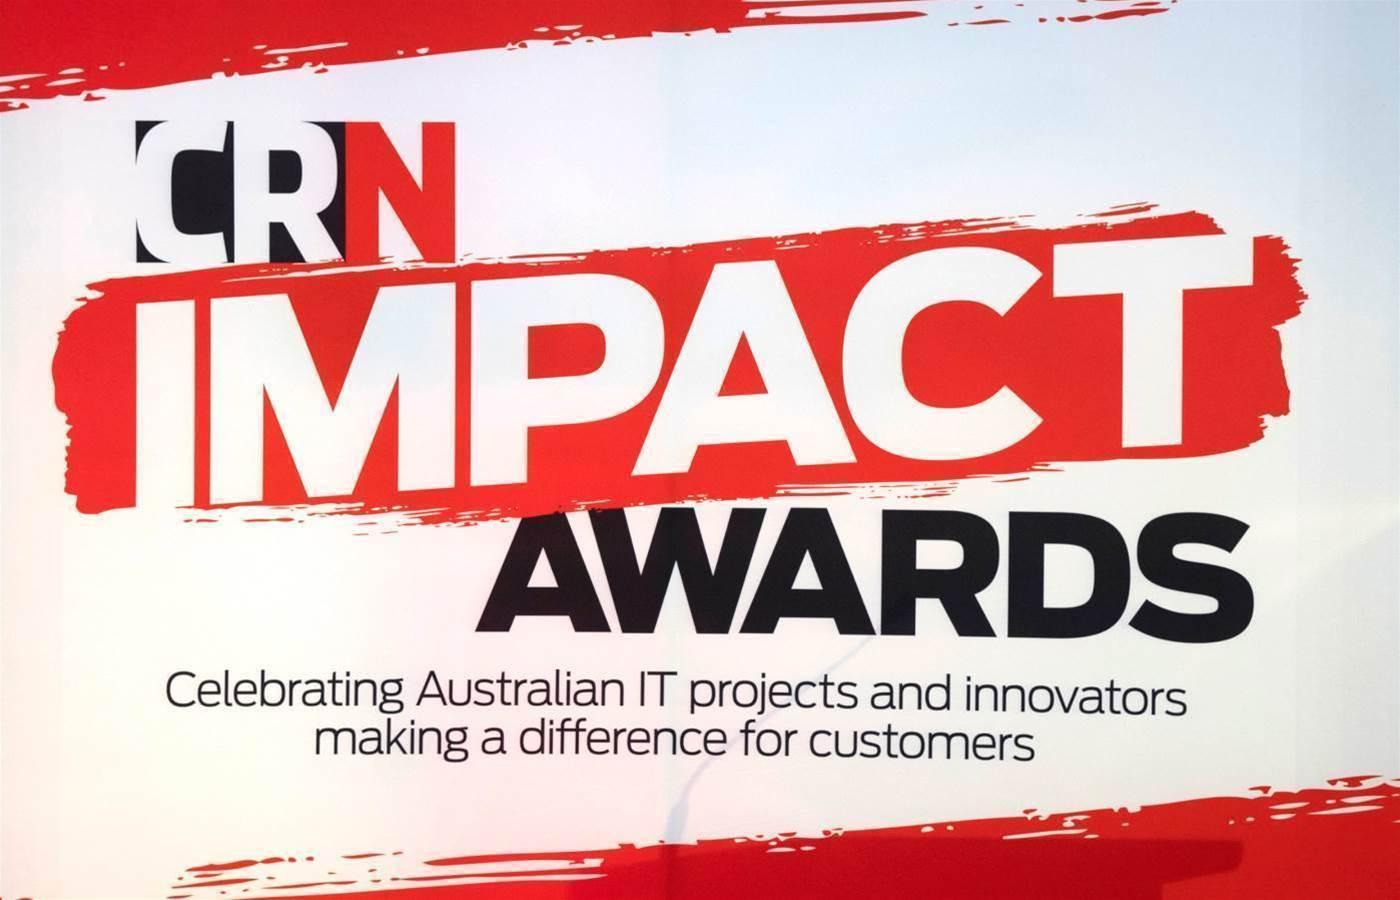 2019 CRN IMPACT Awards winners revealed!